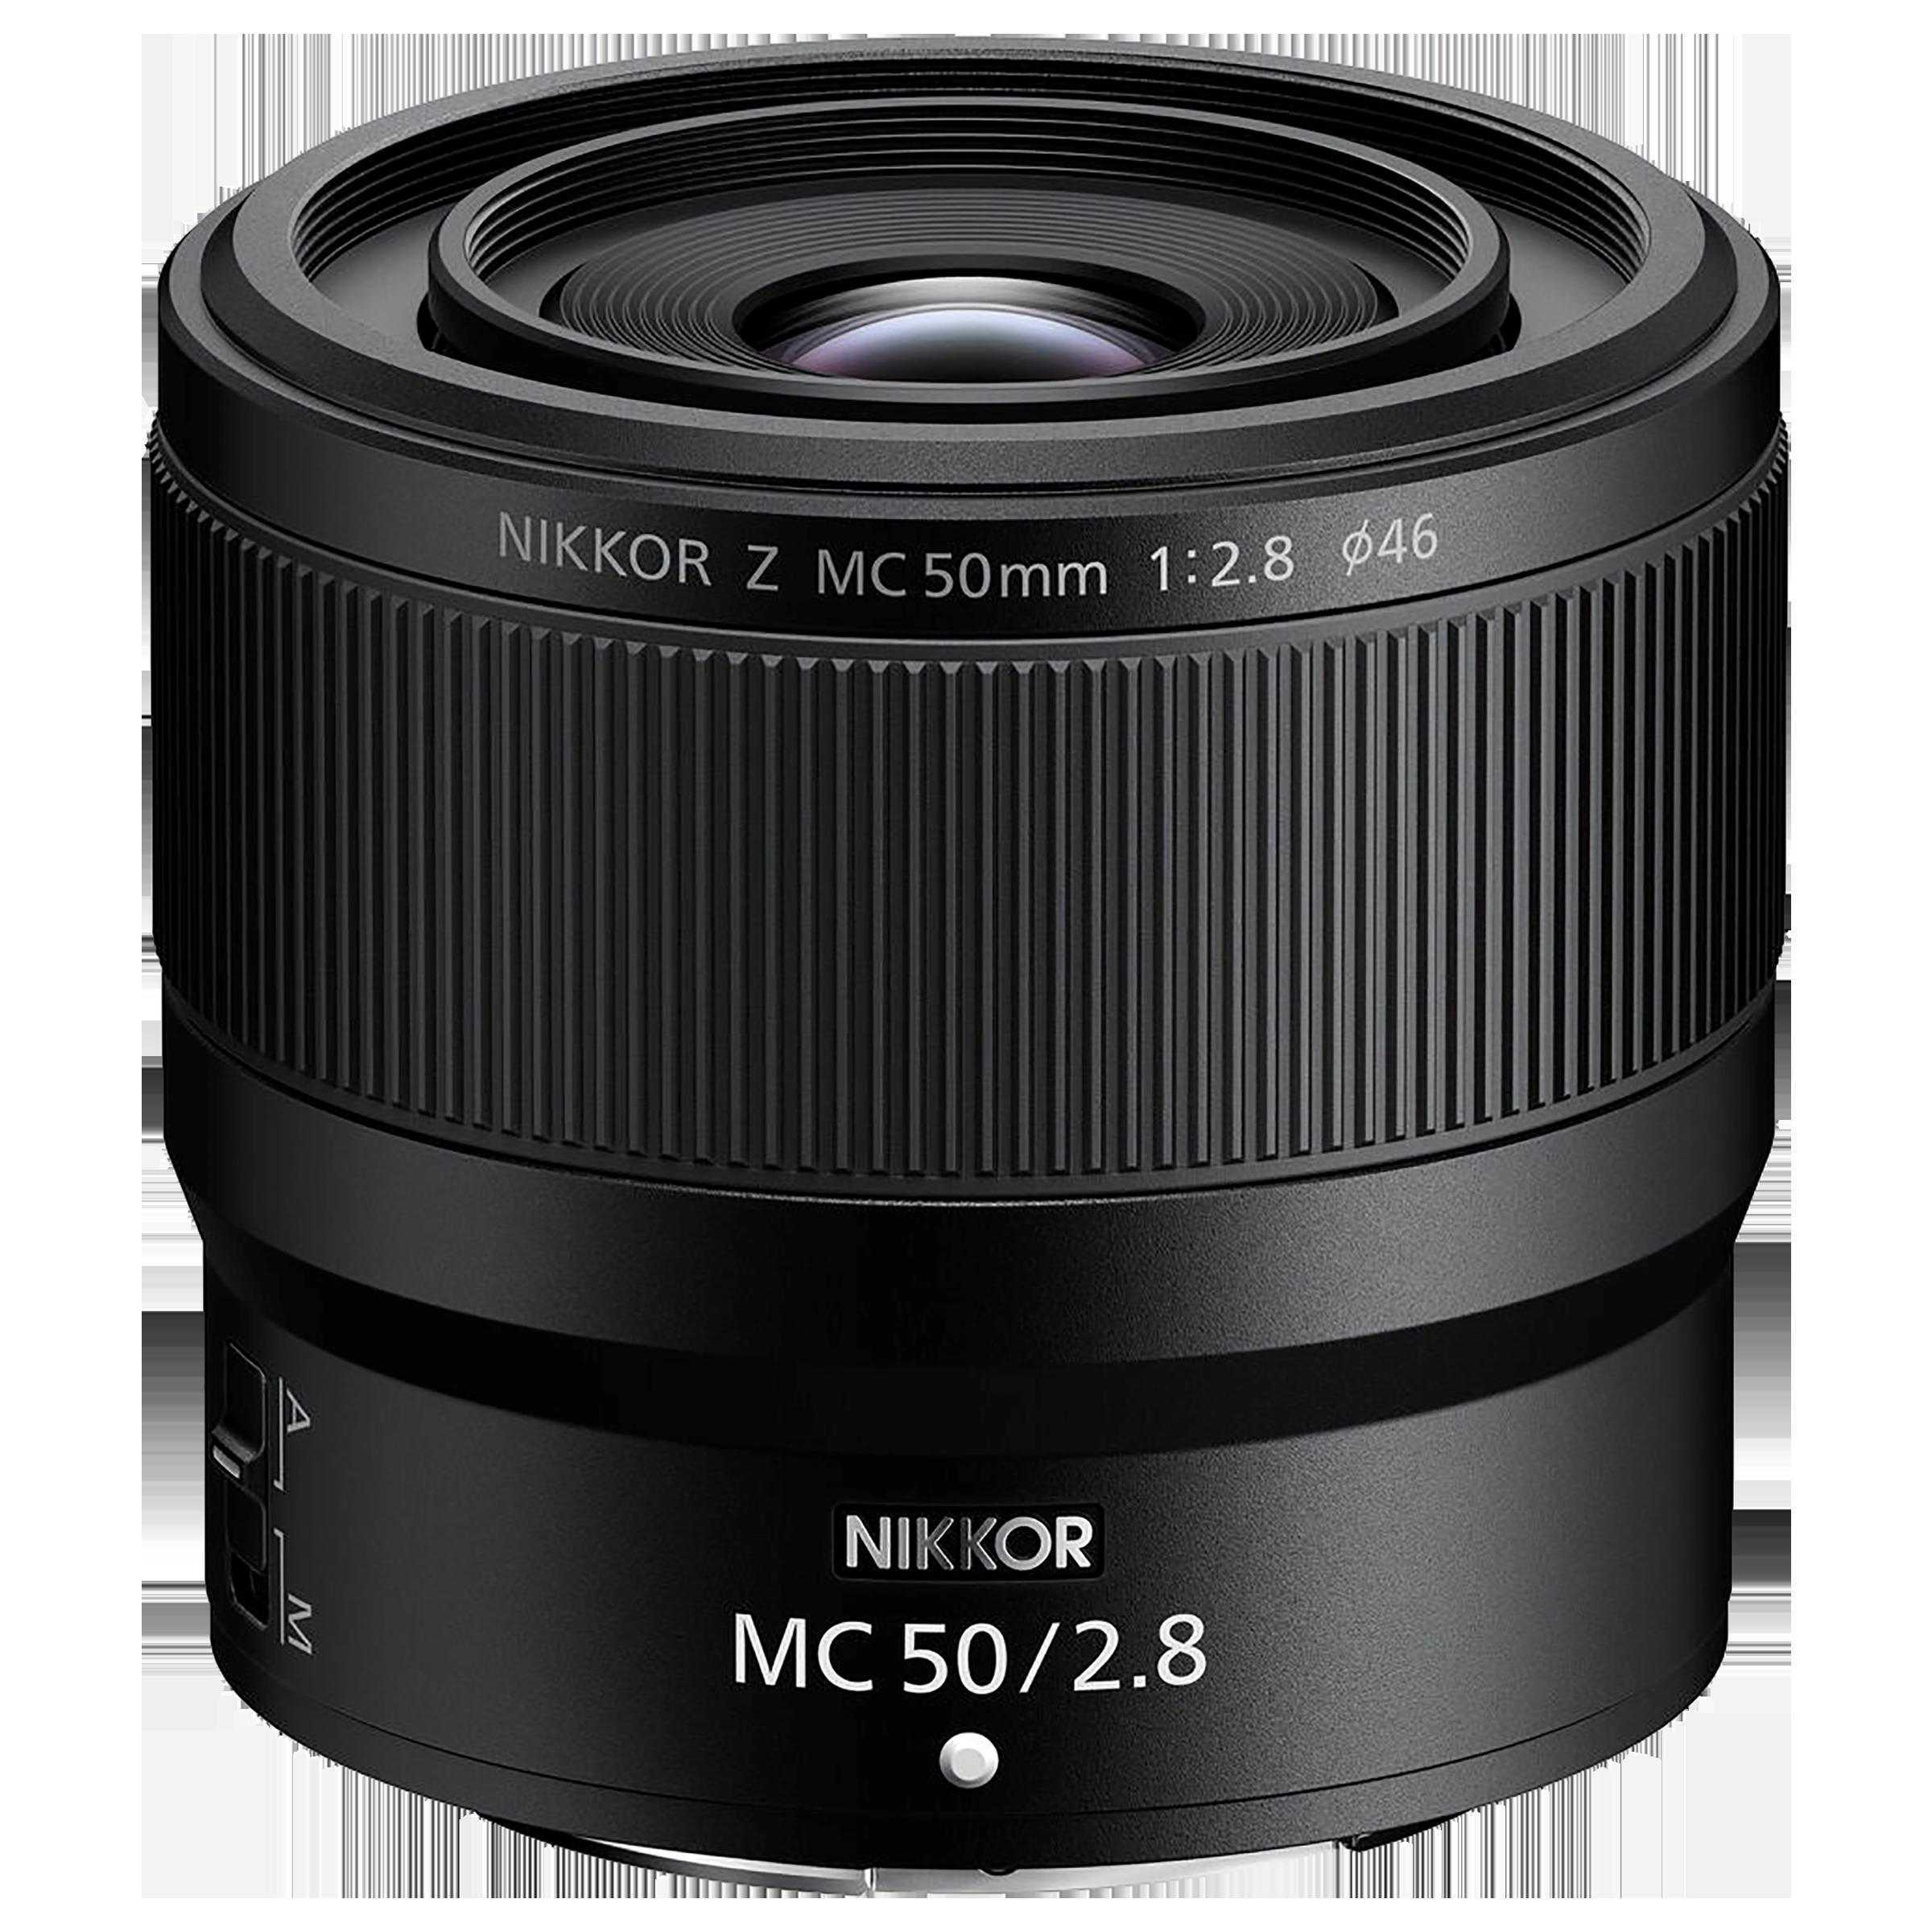 Lens - Nikon Nikkor Z MC 50mm f/2.850 mm F22-F2.8 Macro Lens (1:1 Magnification, JMA603DA, Black)_1